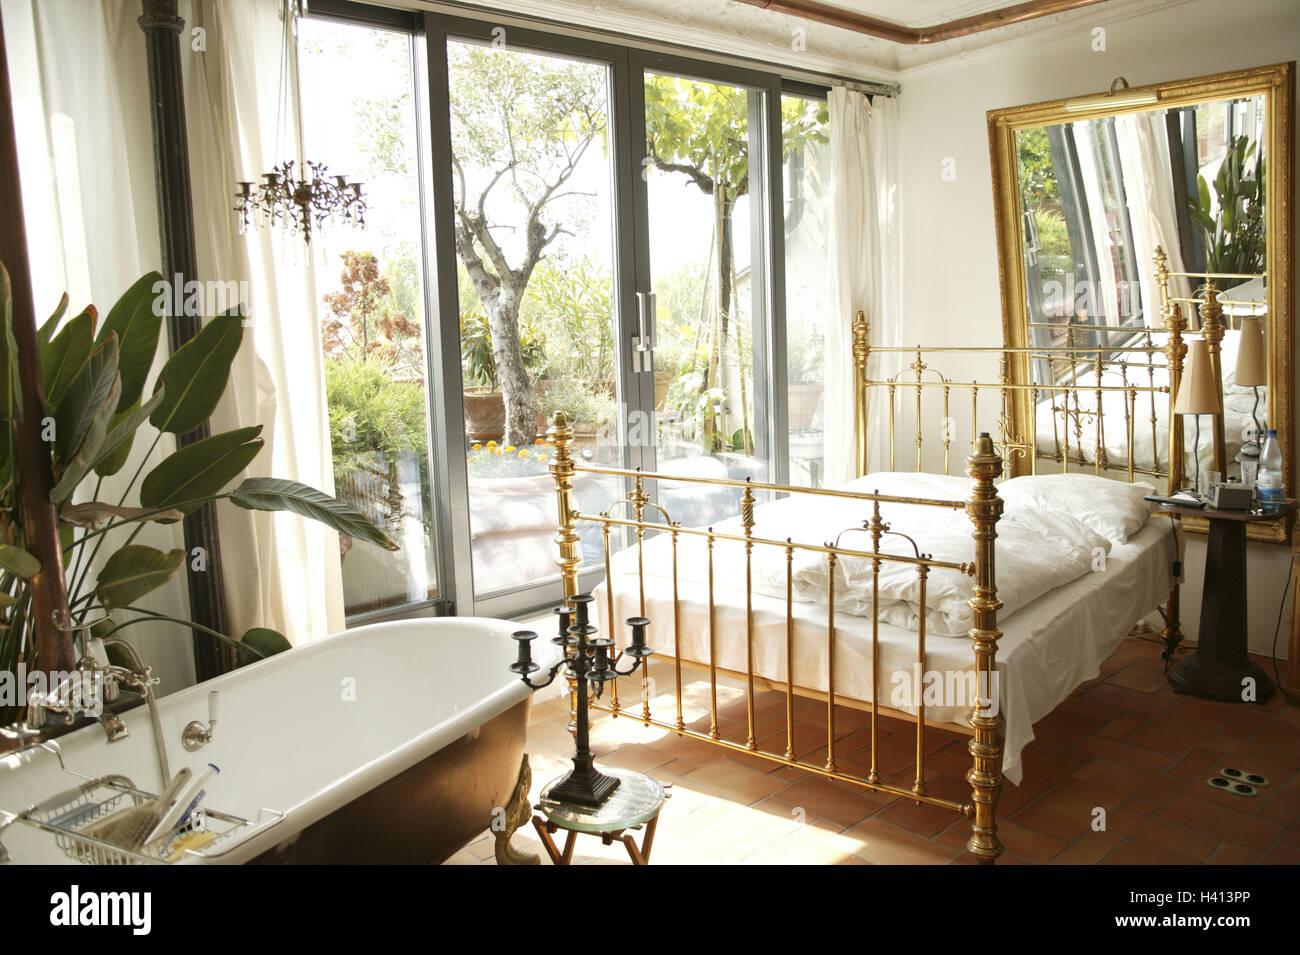 schlafzimmer bett wand reflektor bad terrassent r lebende zimmer messing bett badewanne. Black Bedroom Furniture Sets. Home Design Ideas